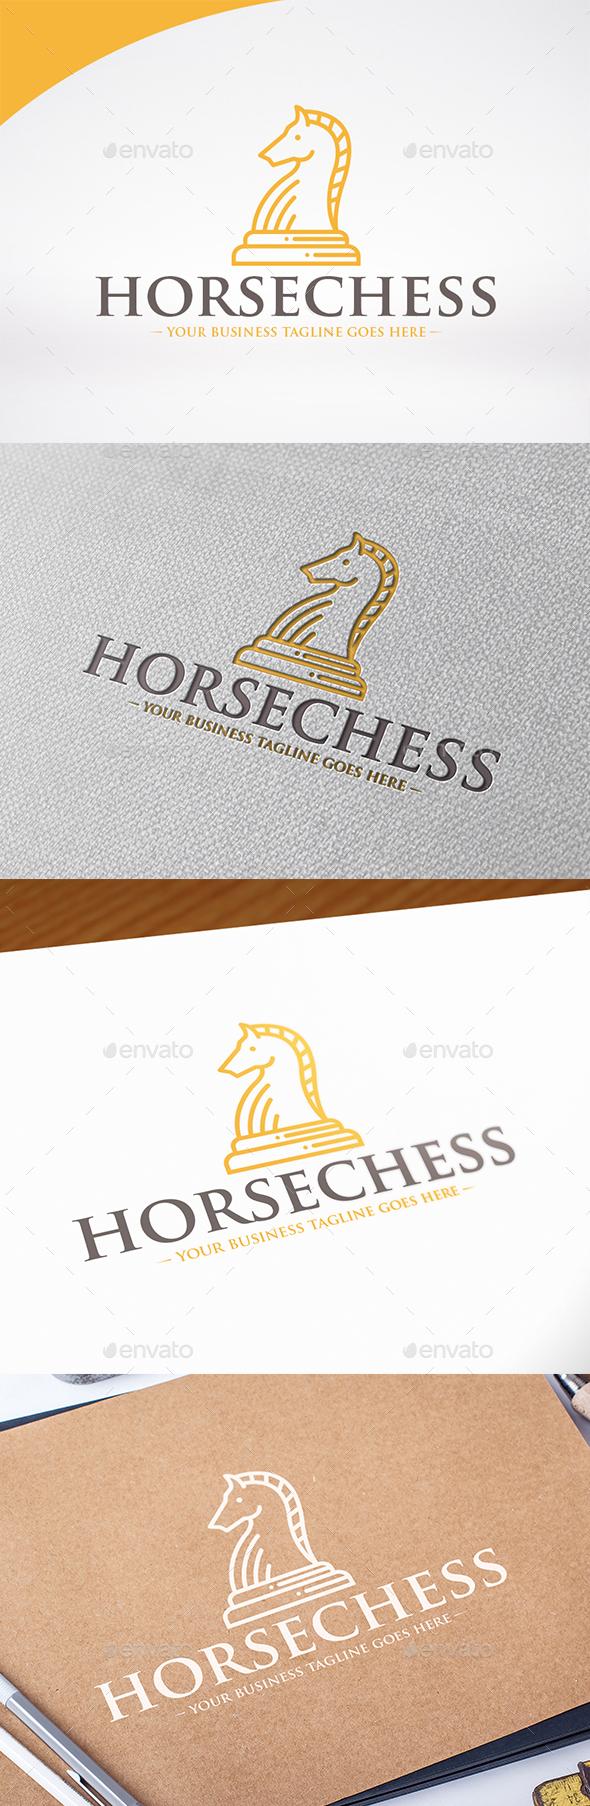 Horse Chess Logo Template - Symbols Logo Templates